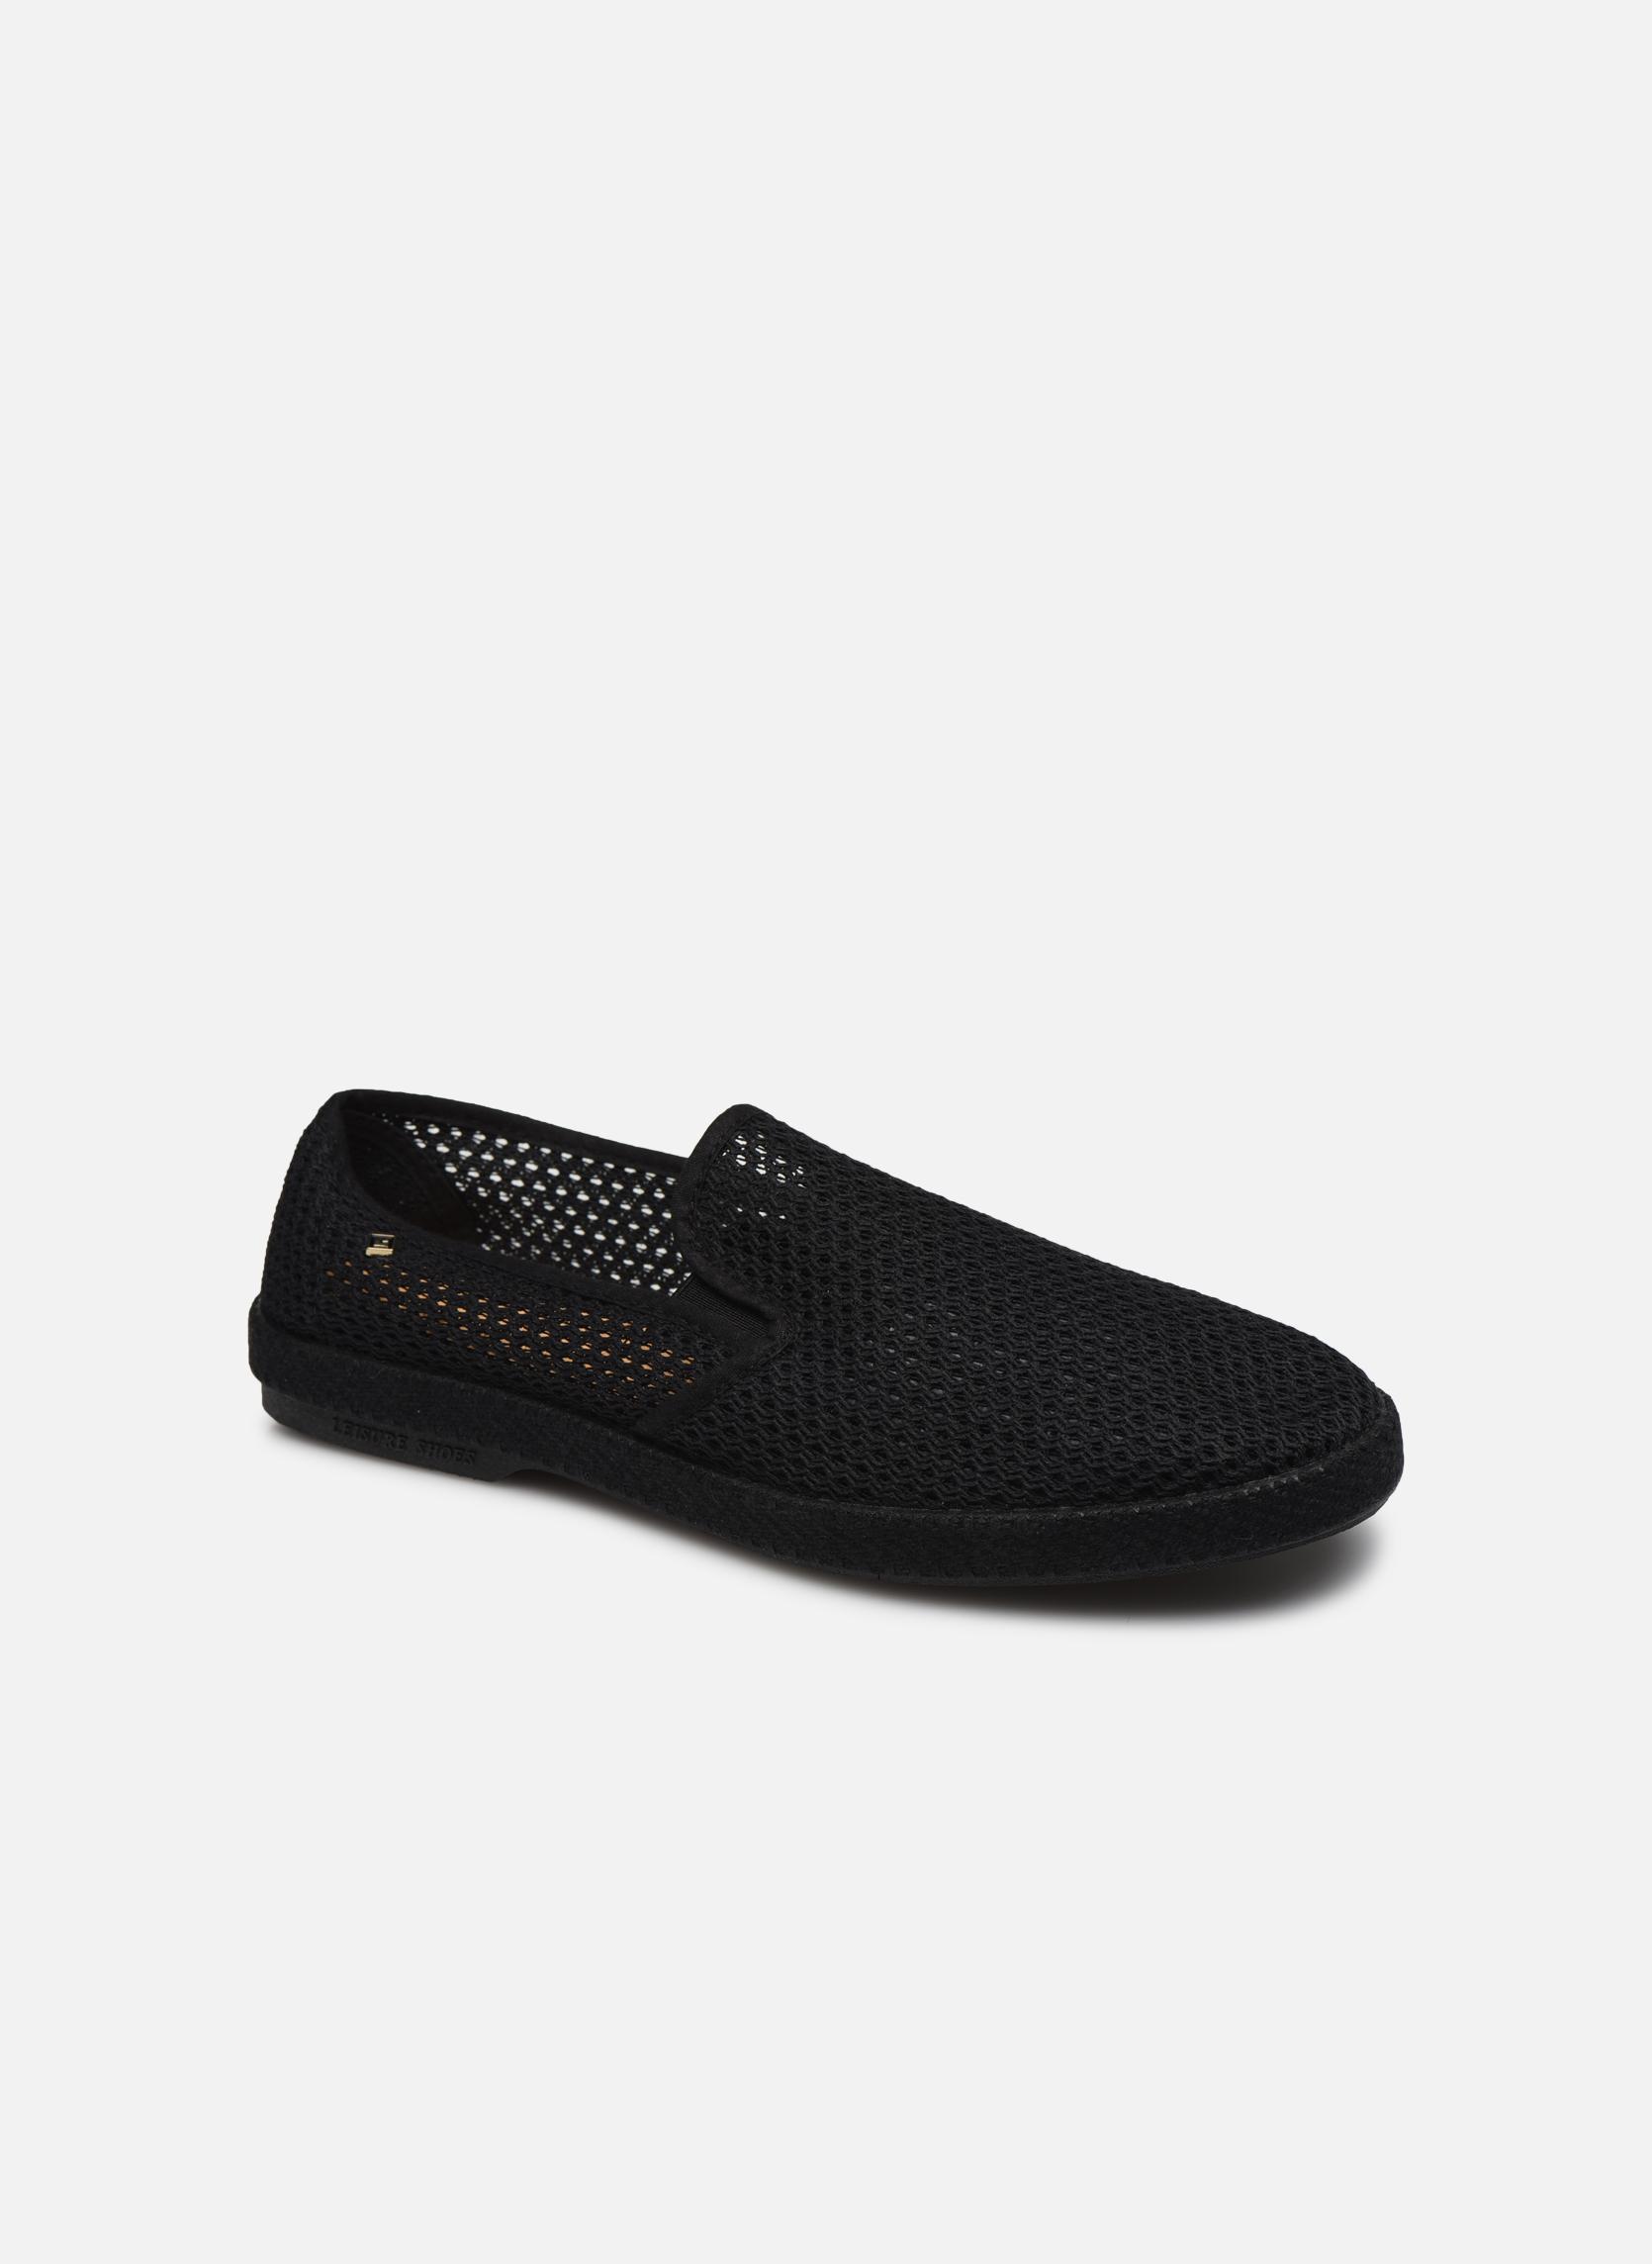 Loafers Herr 30°c m